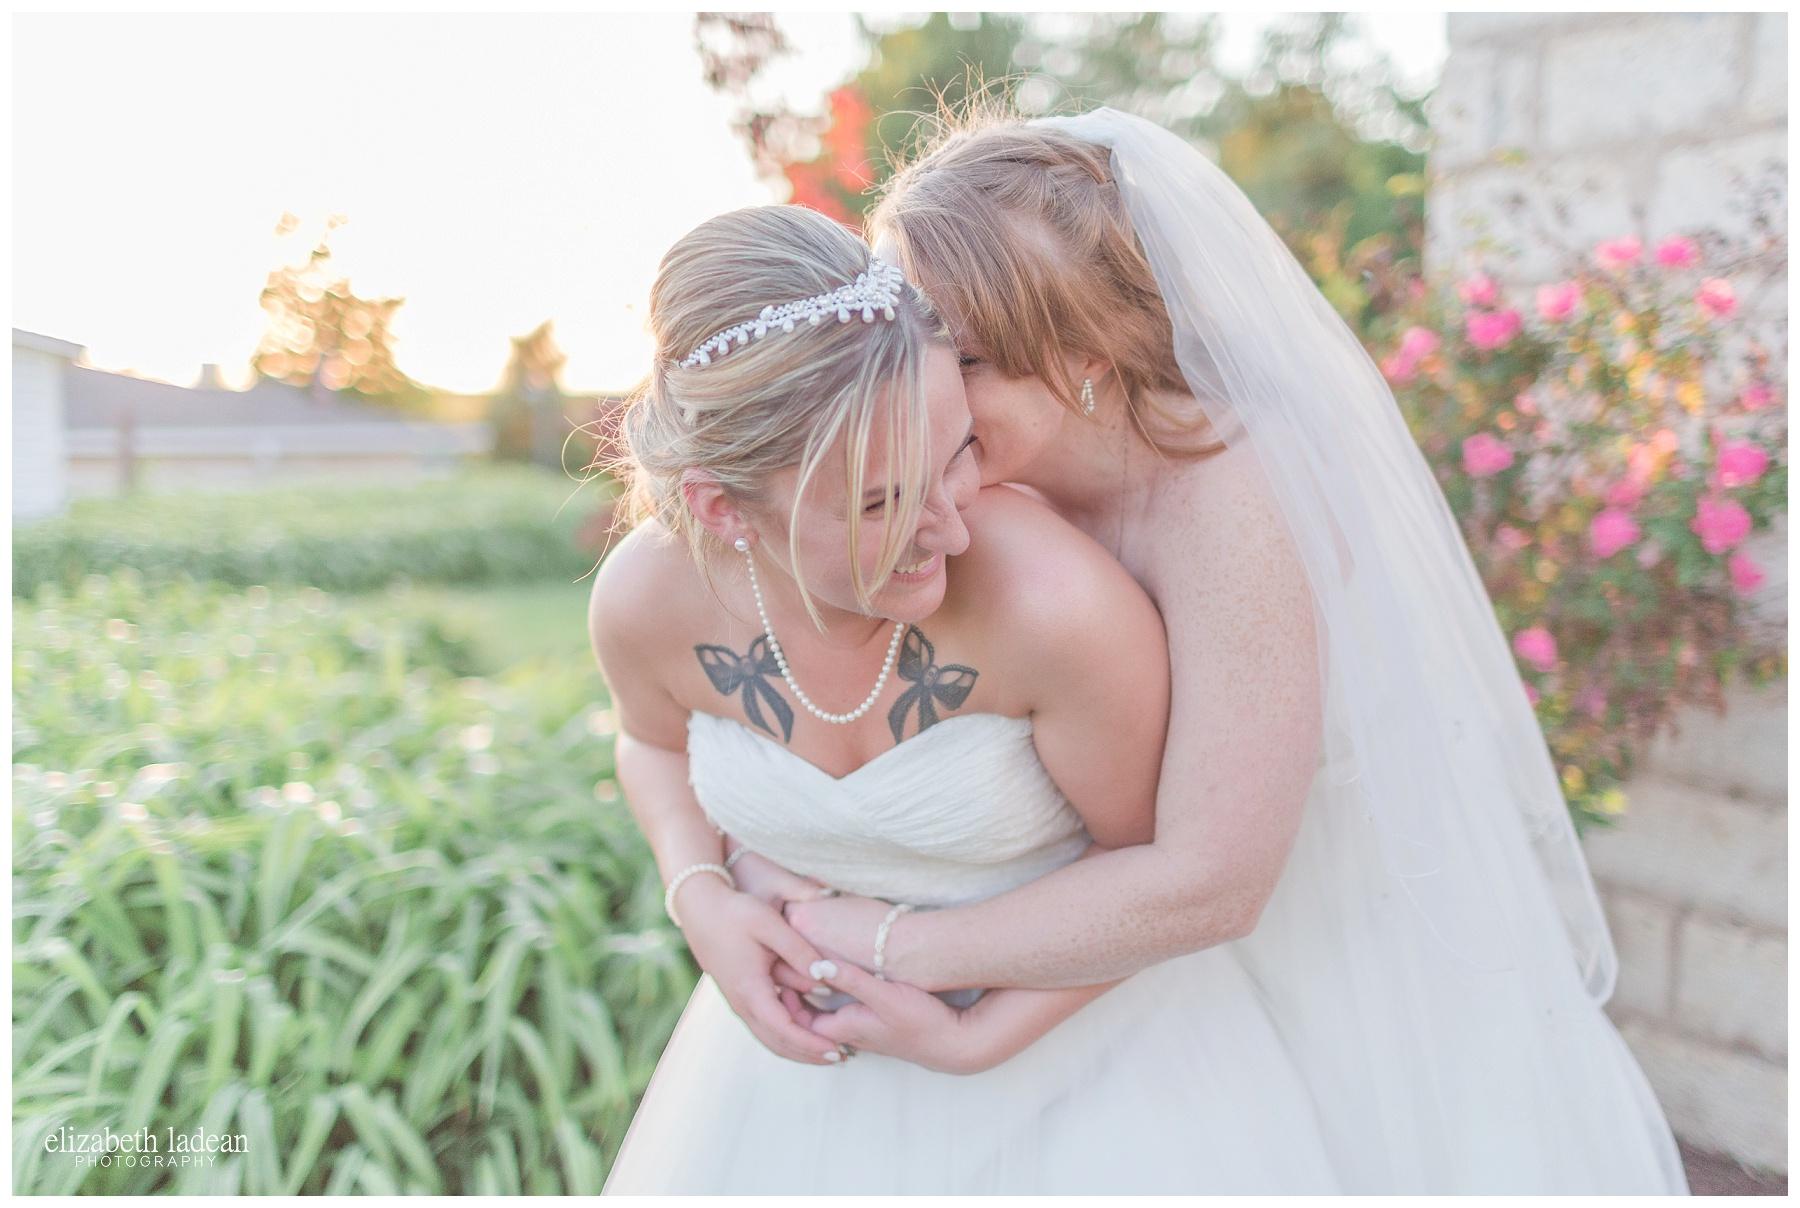 Thompson-Barn-Kansas-Wedding-Photography-R+J-0505-Elizabeth-Ladean-Photography-photo_0721.jpg